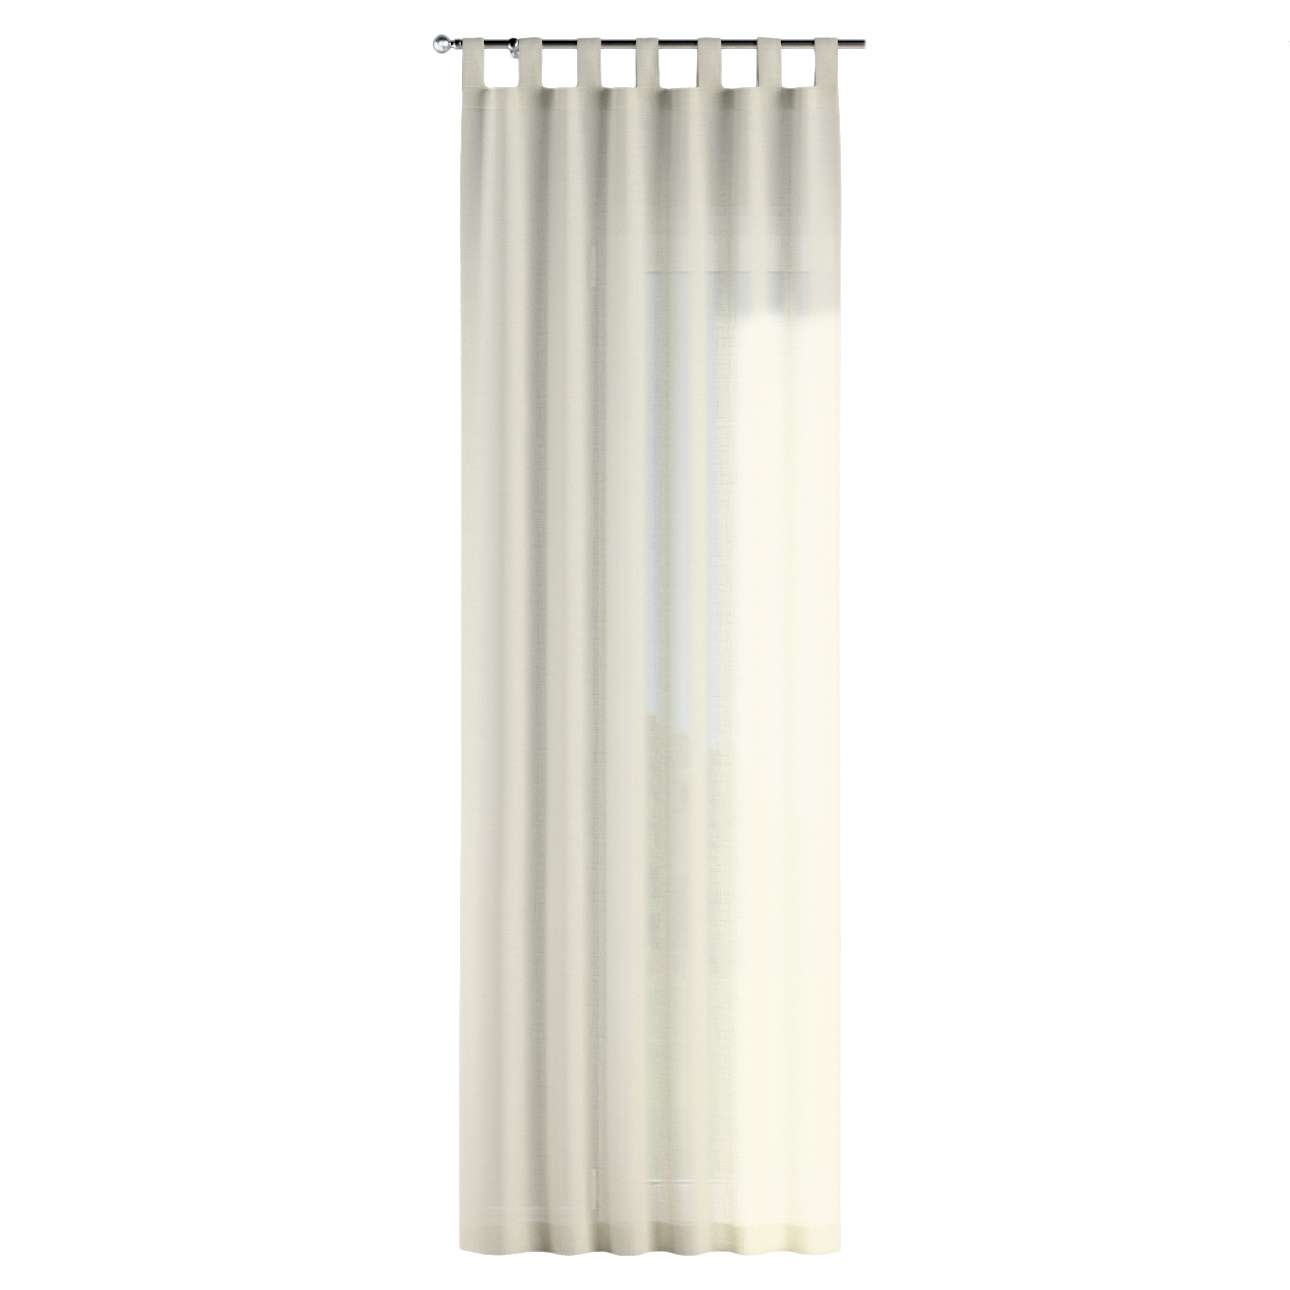 Gardin med stropper 130 x 260 cm fra kollektionen Romantik, Stof: 128-88